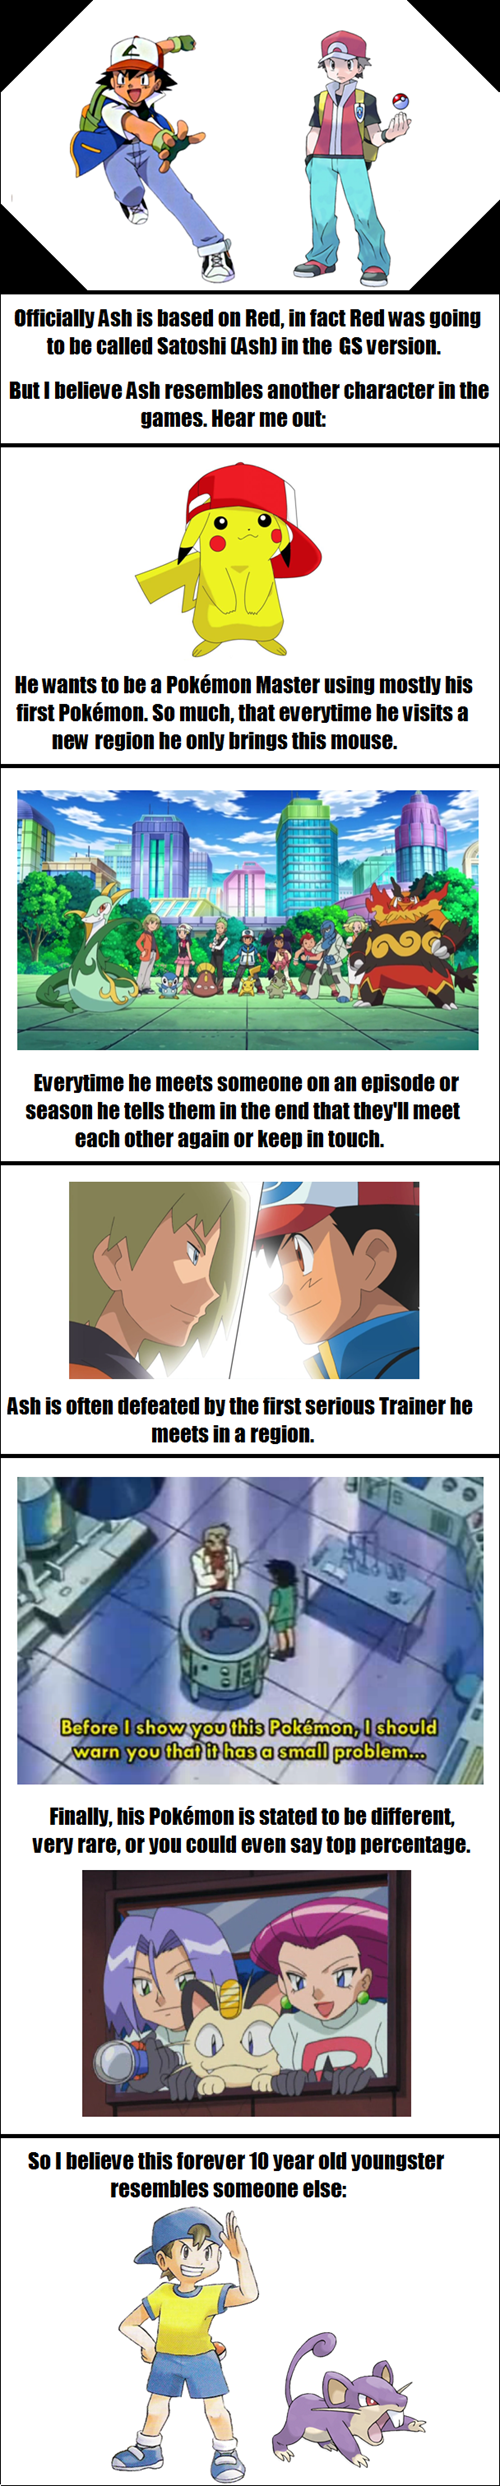 ash,Pokémon,red